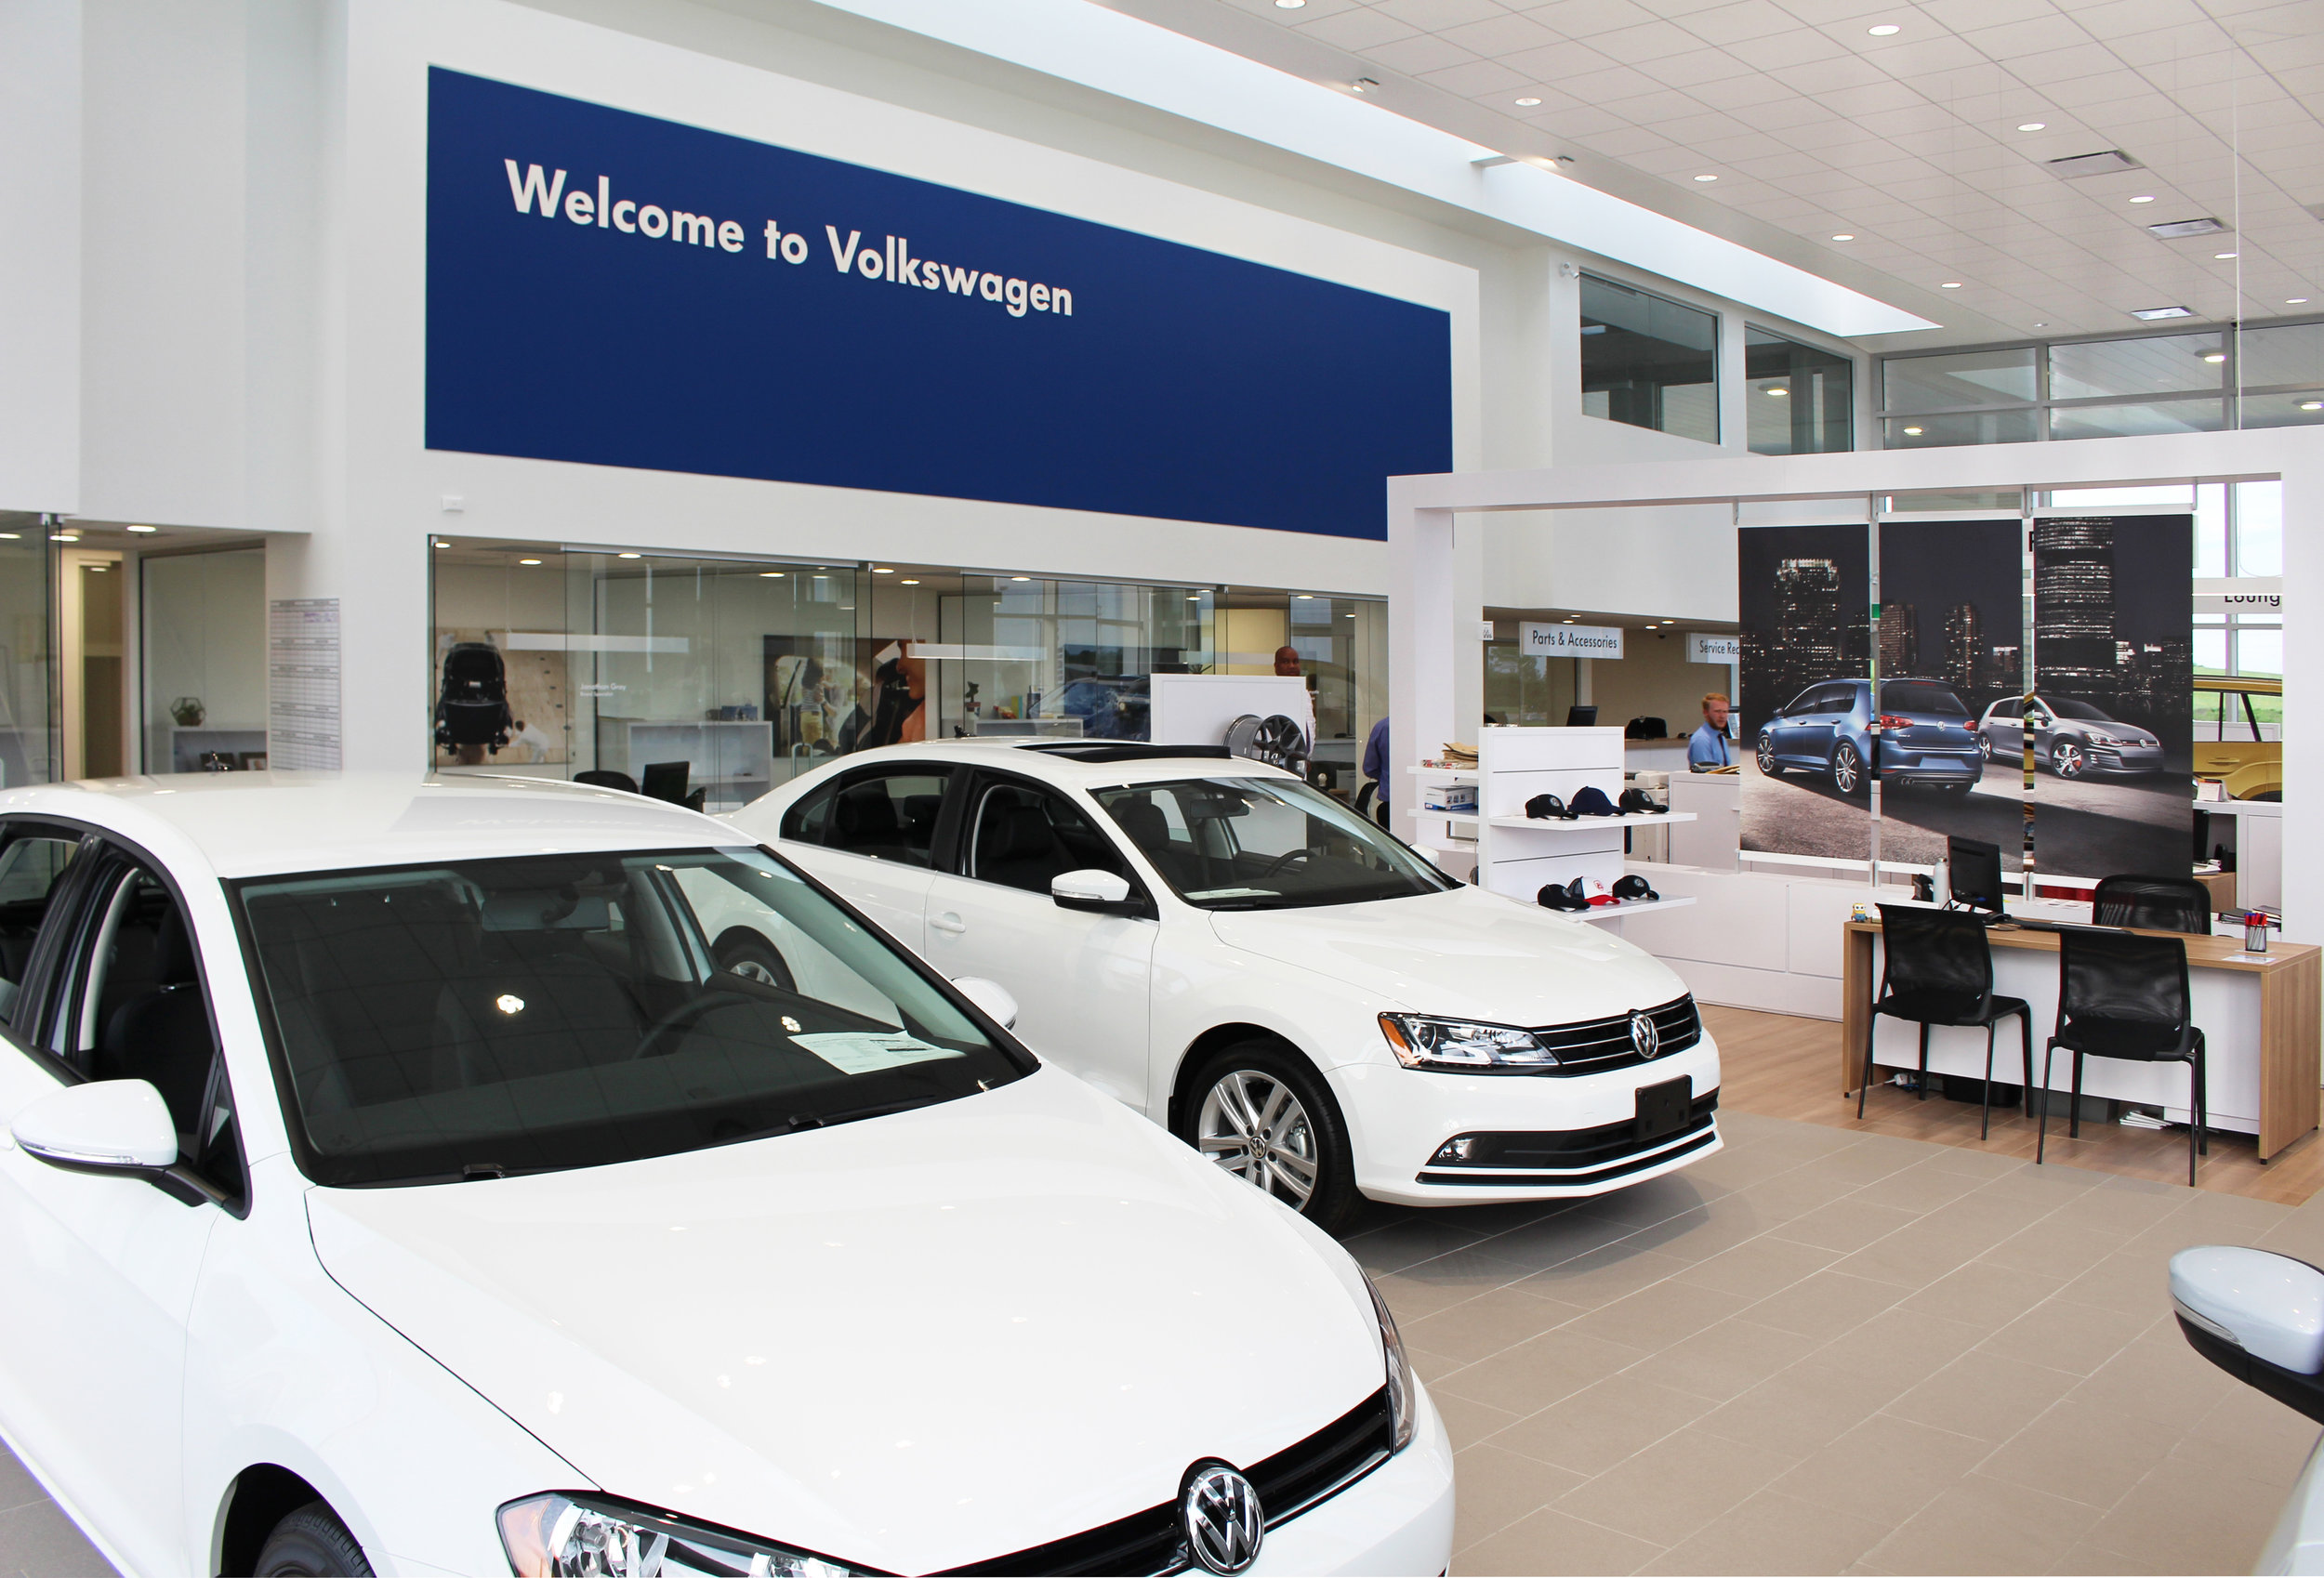 Volkswagen Photoshop 2.jpg